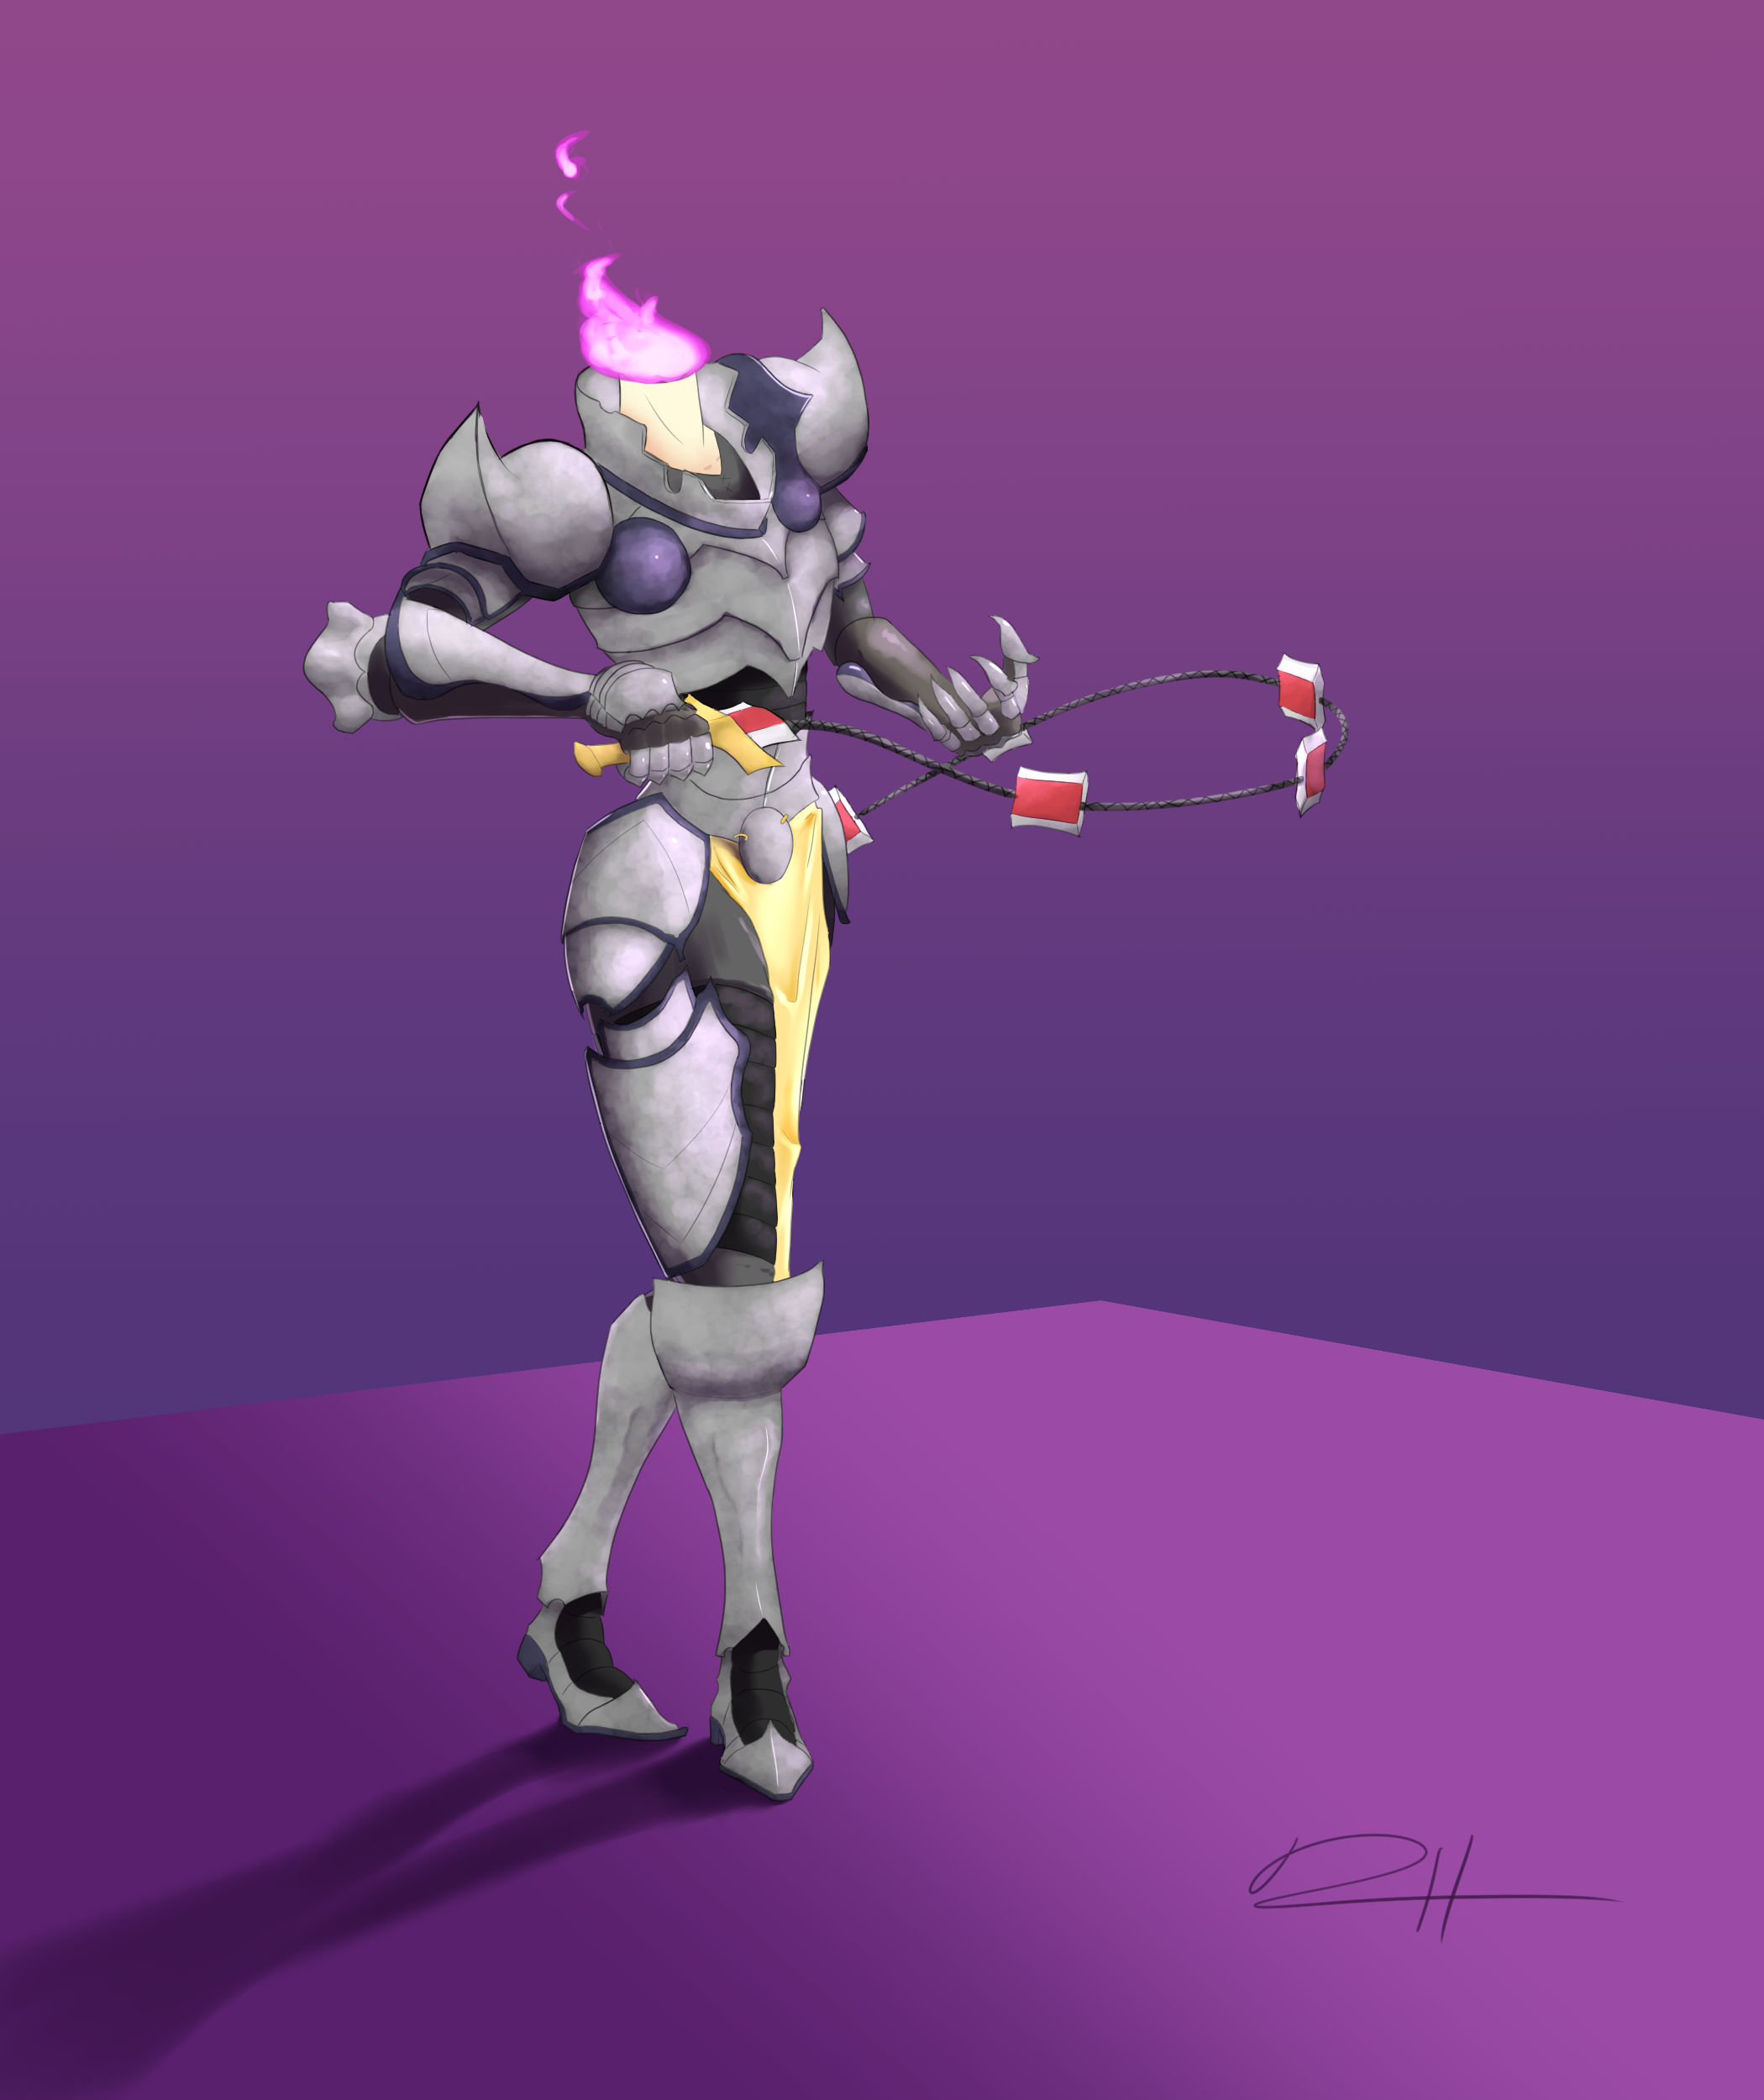 Dull Knight